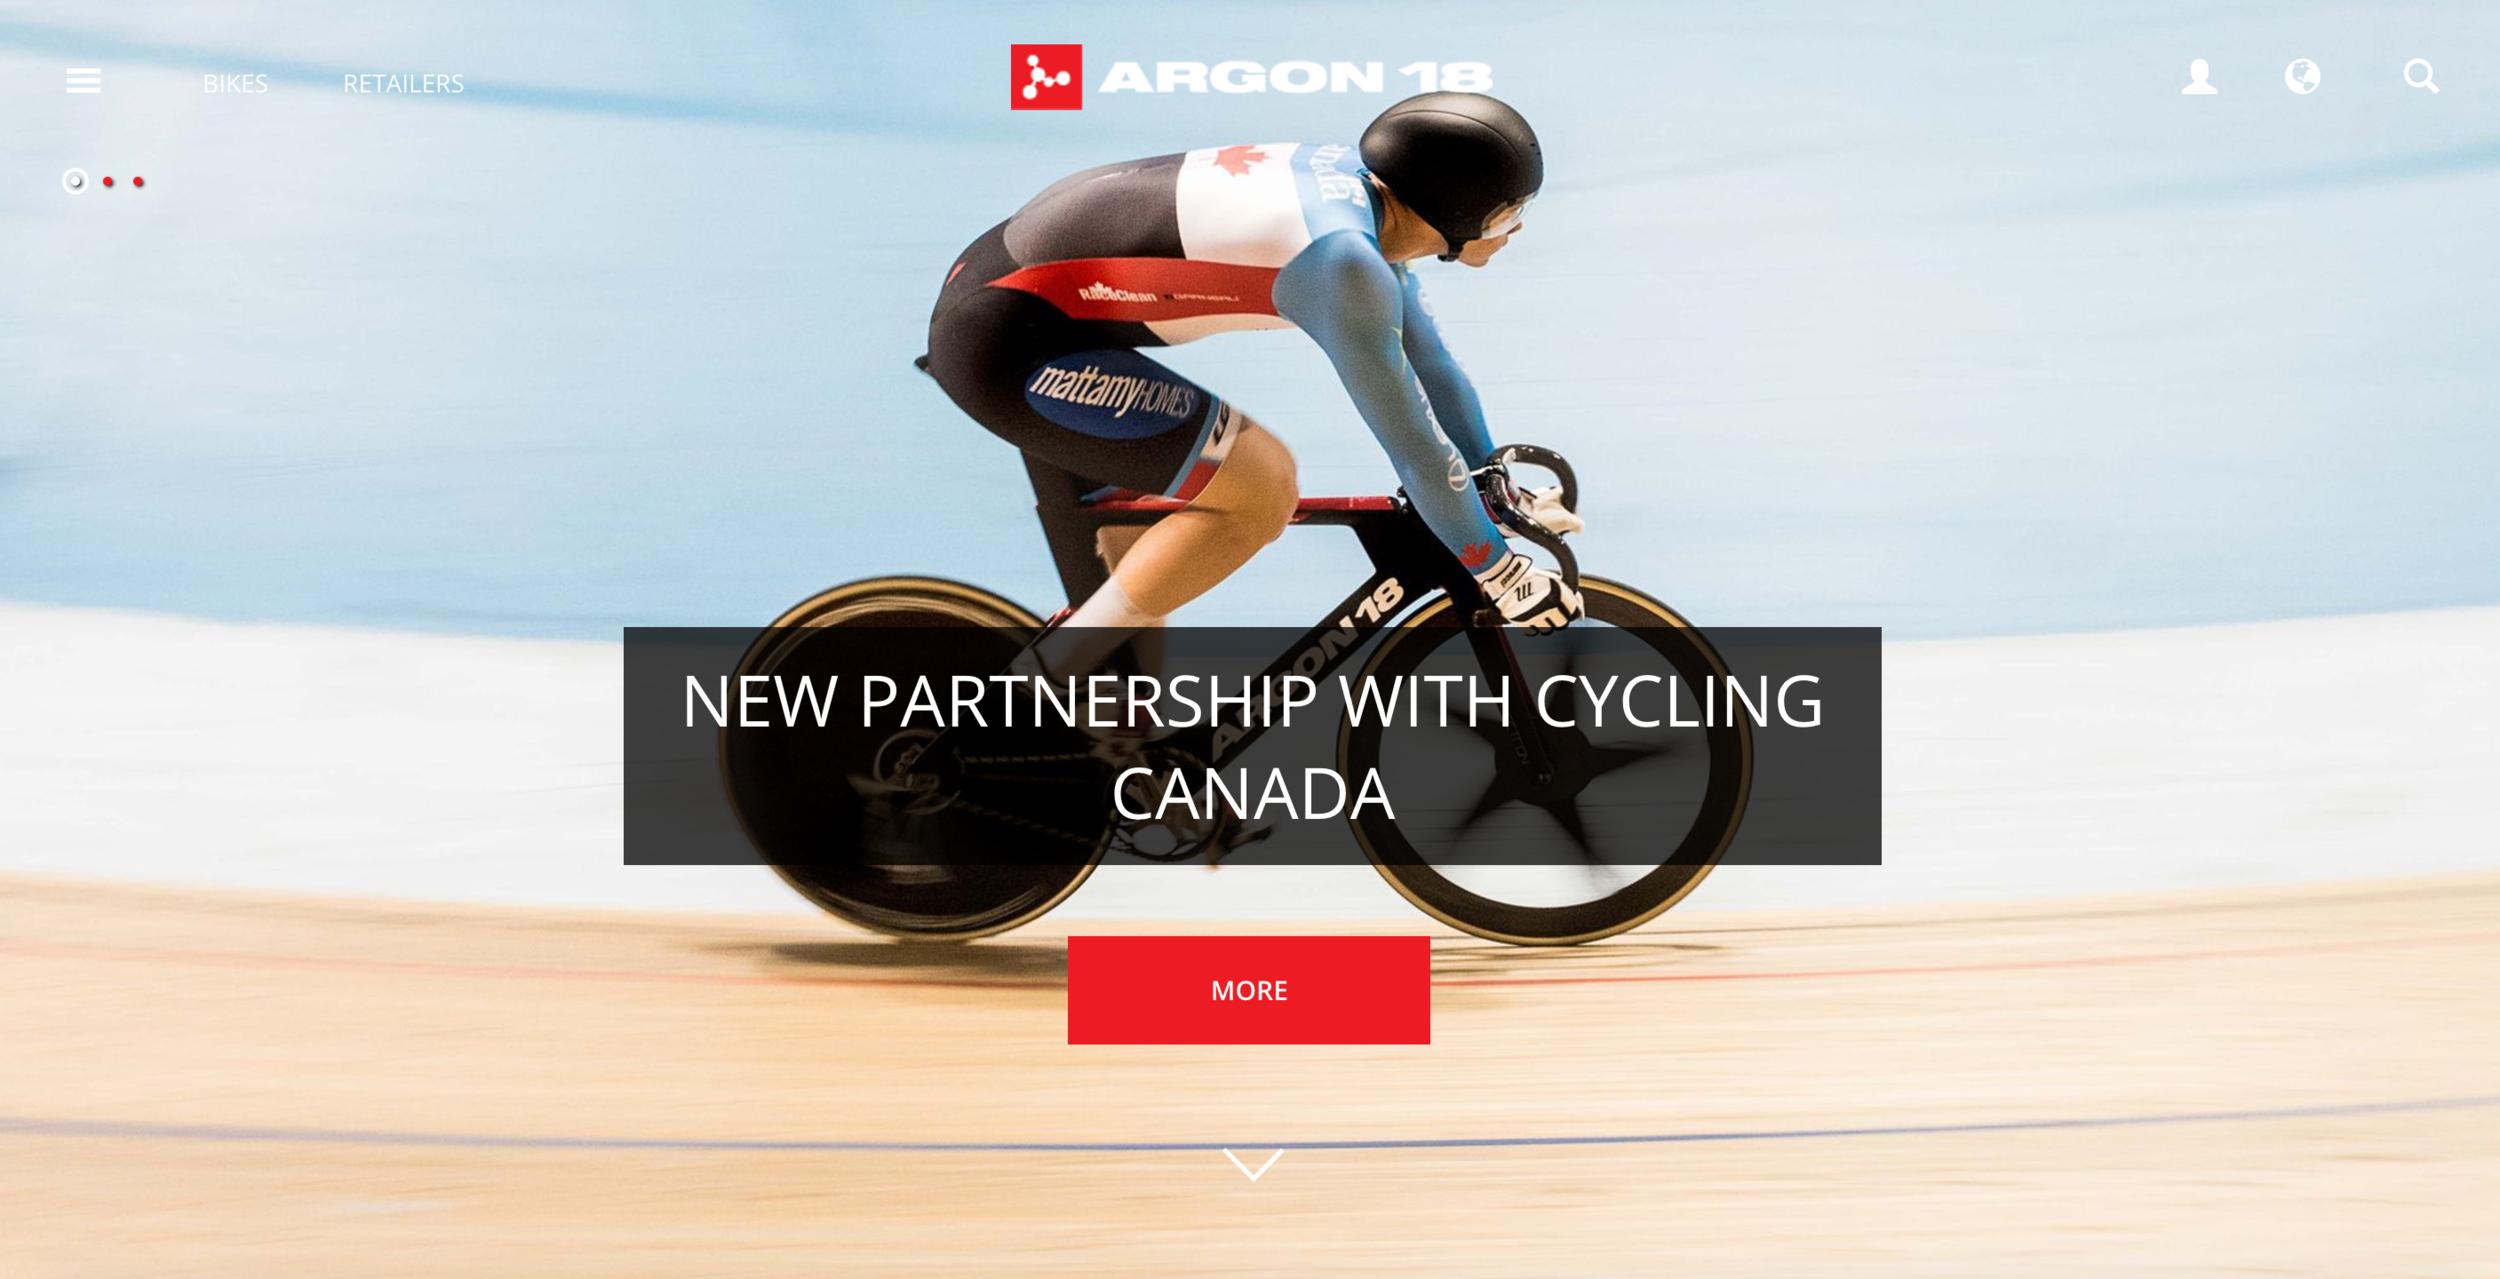 Argon 18 cycling Canada partnership ancouncment